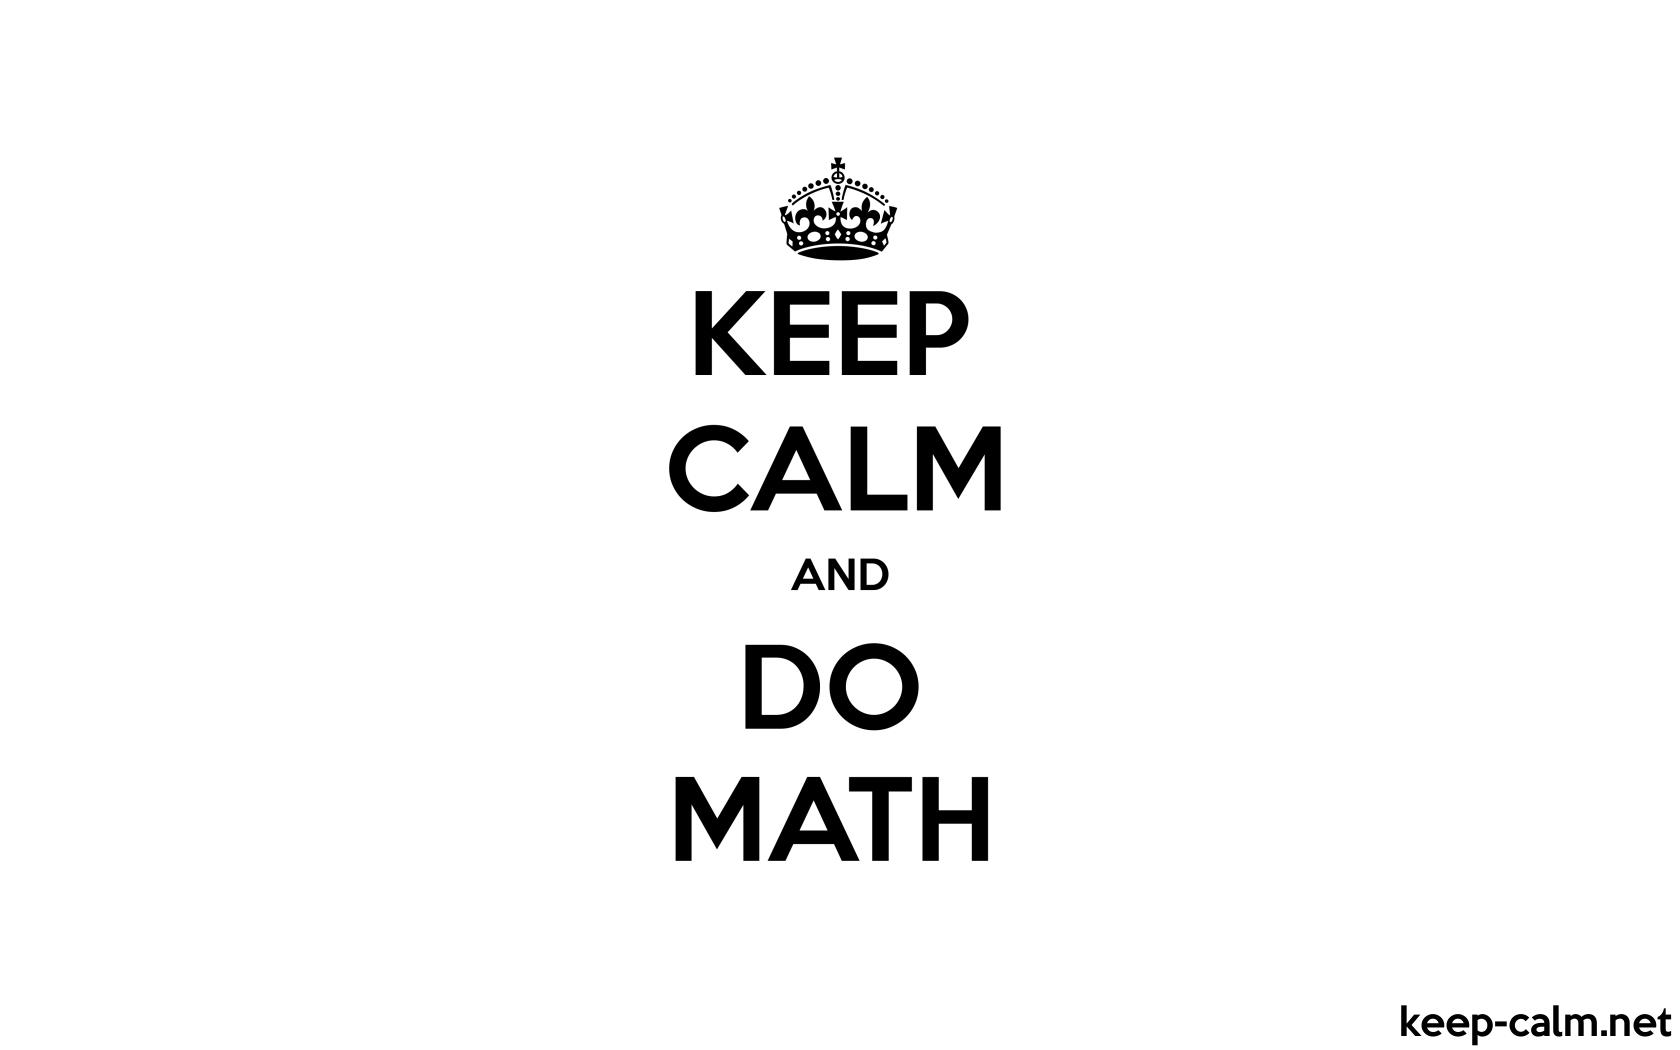 KEEP CALM AND DO MATH